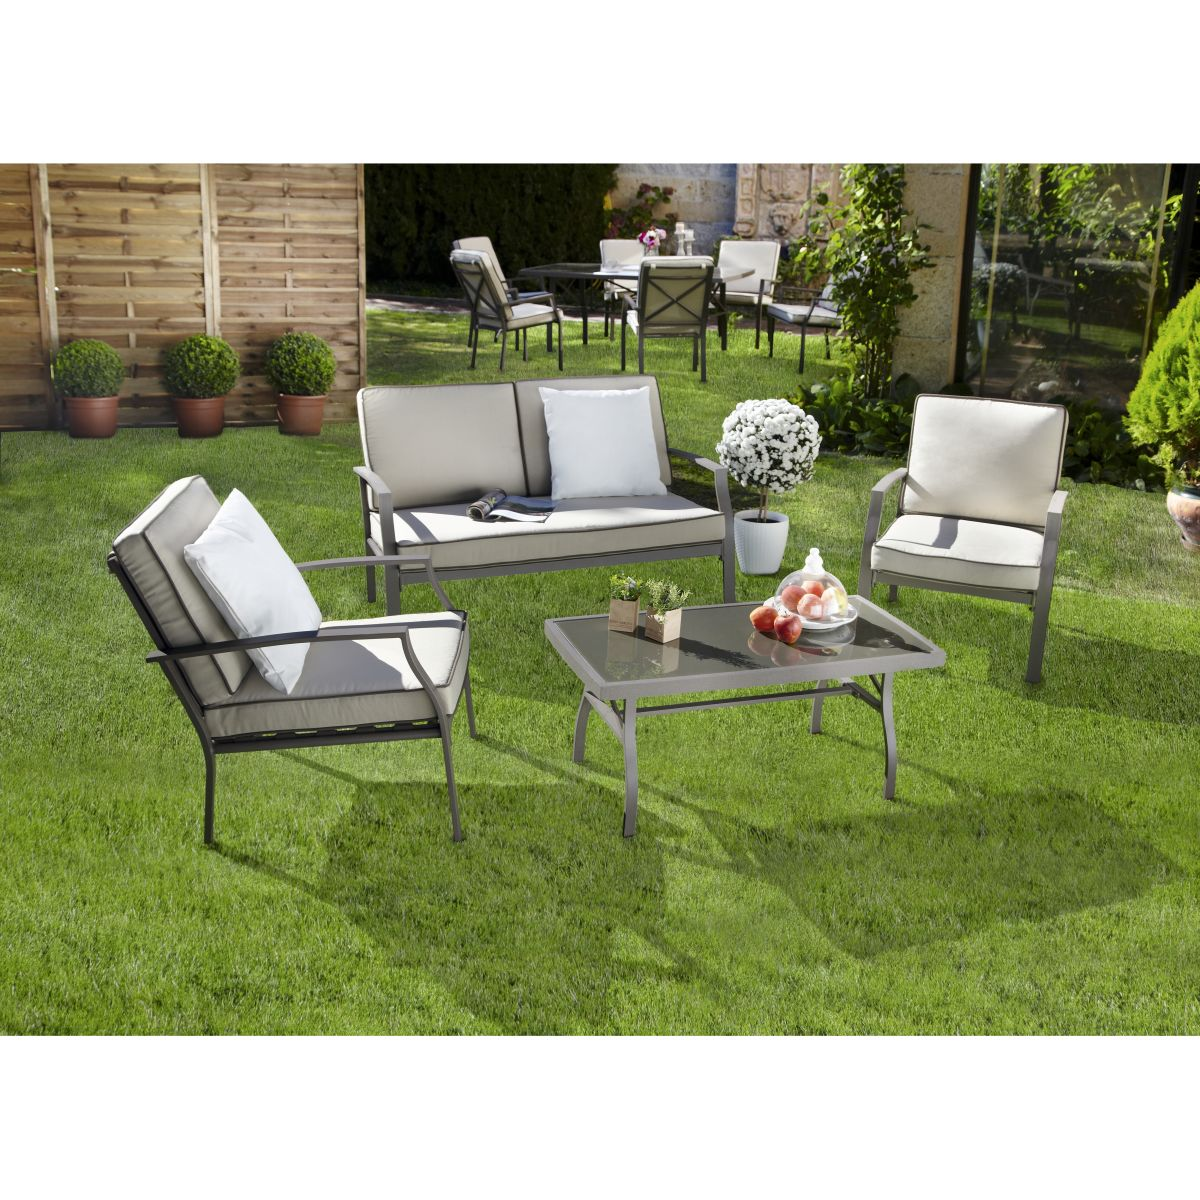 best tavolo giardino usato gallery